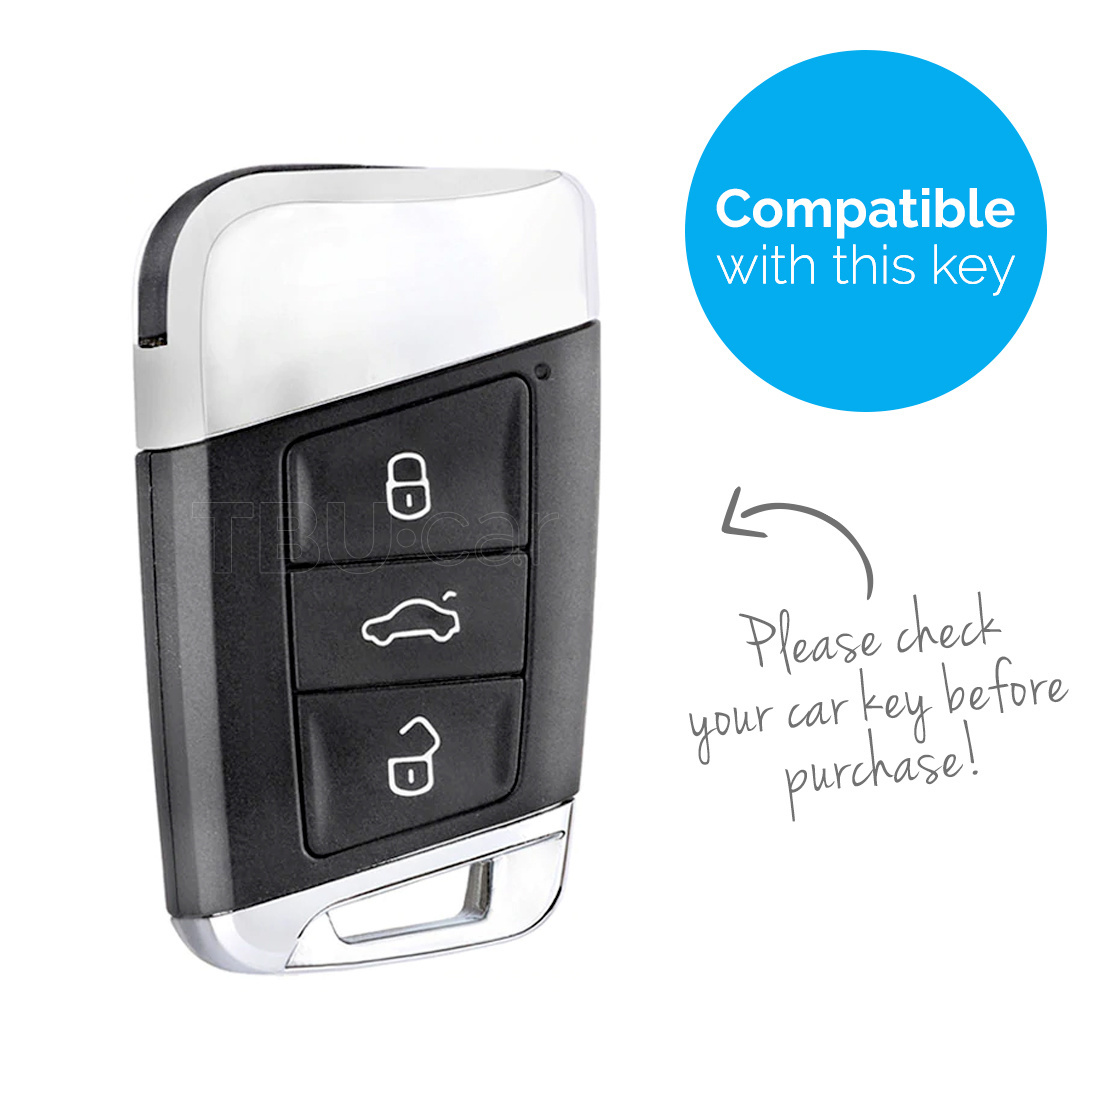 TBU car TBU car Sleutel cover compatibel met VW - TPU sleutel hoesje / beschermhoesje autosleutel - Chrome